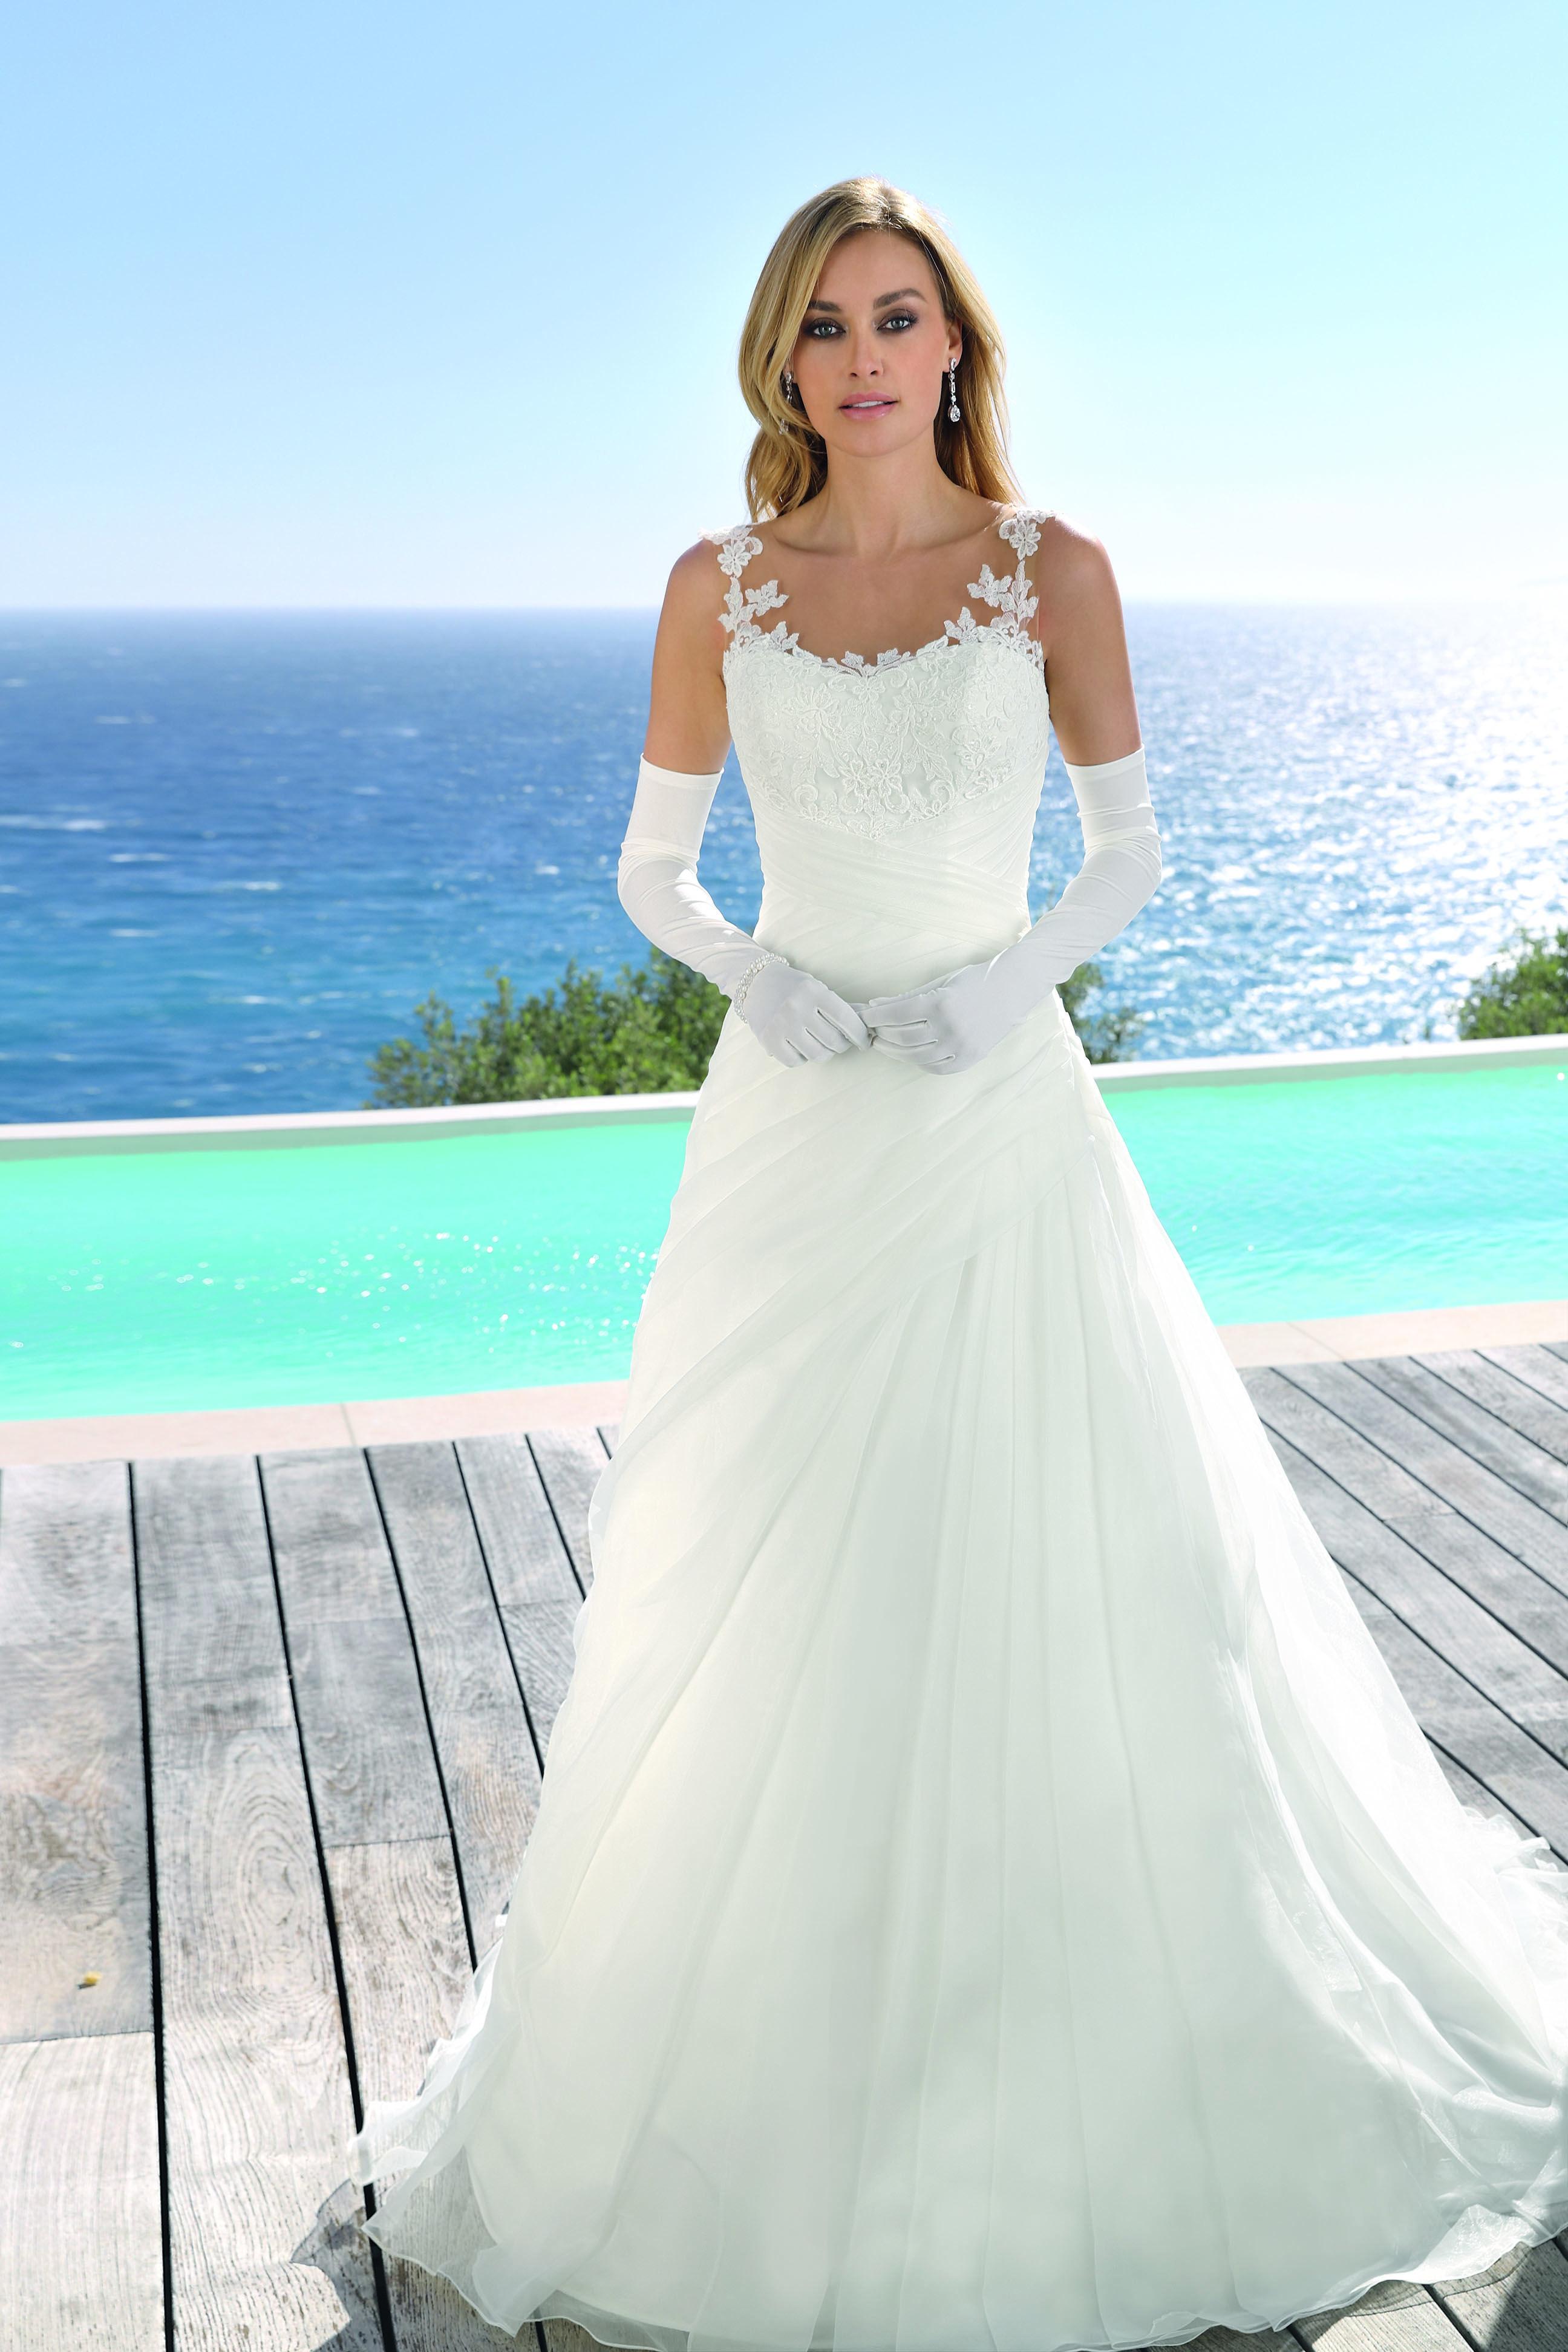 ladybird | Pinterest | Wedding dress and Weddings